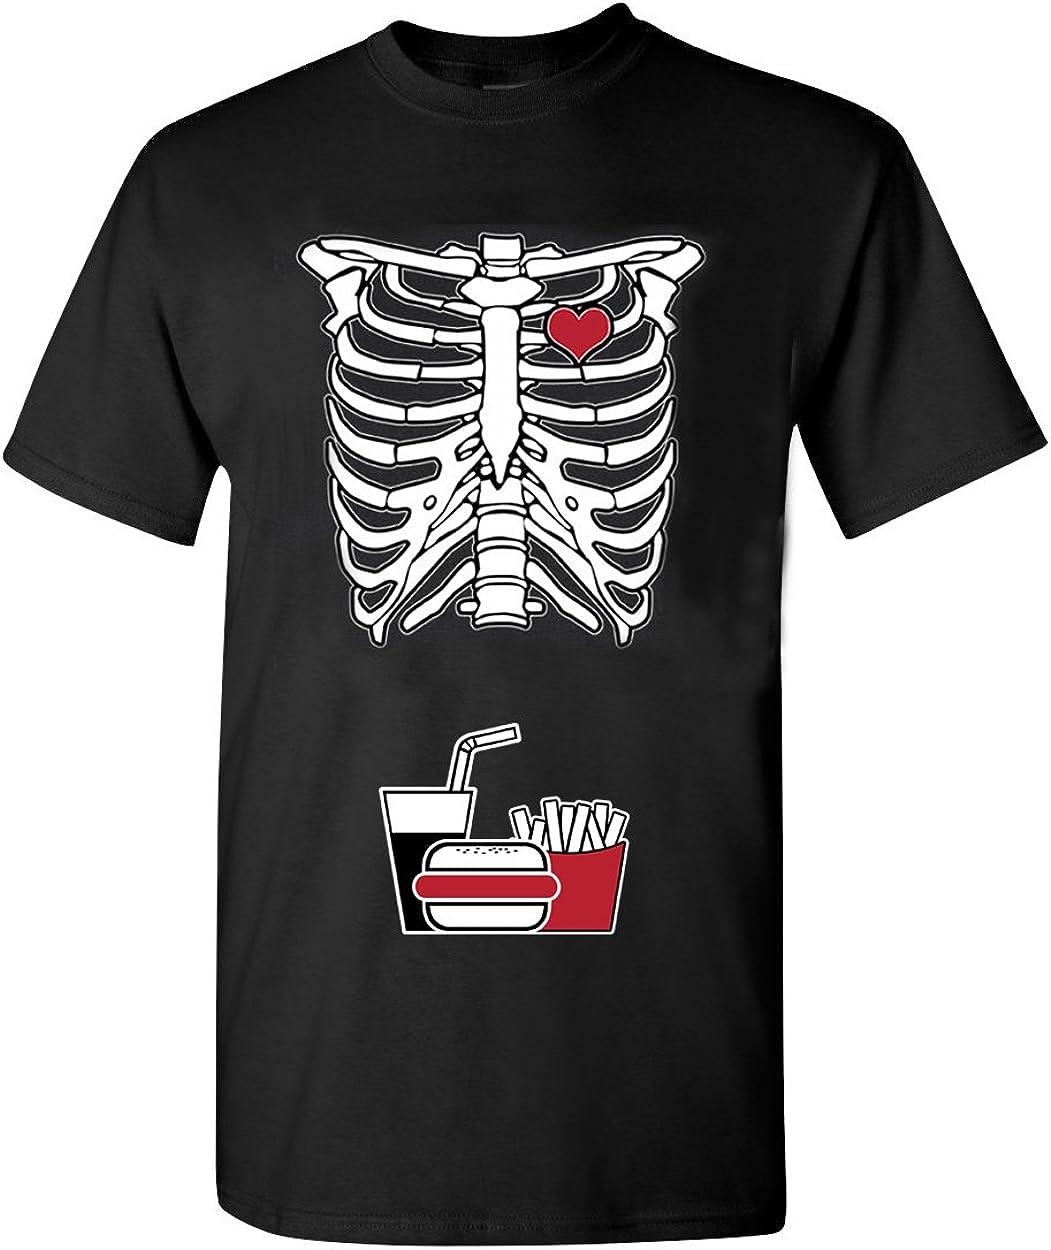 Skeleton Junk Food DT Adult T-Shirt Tee